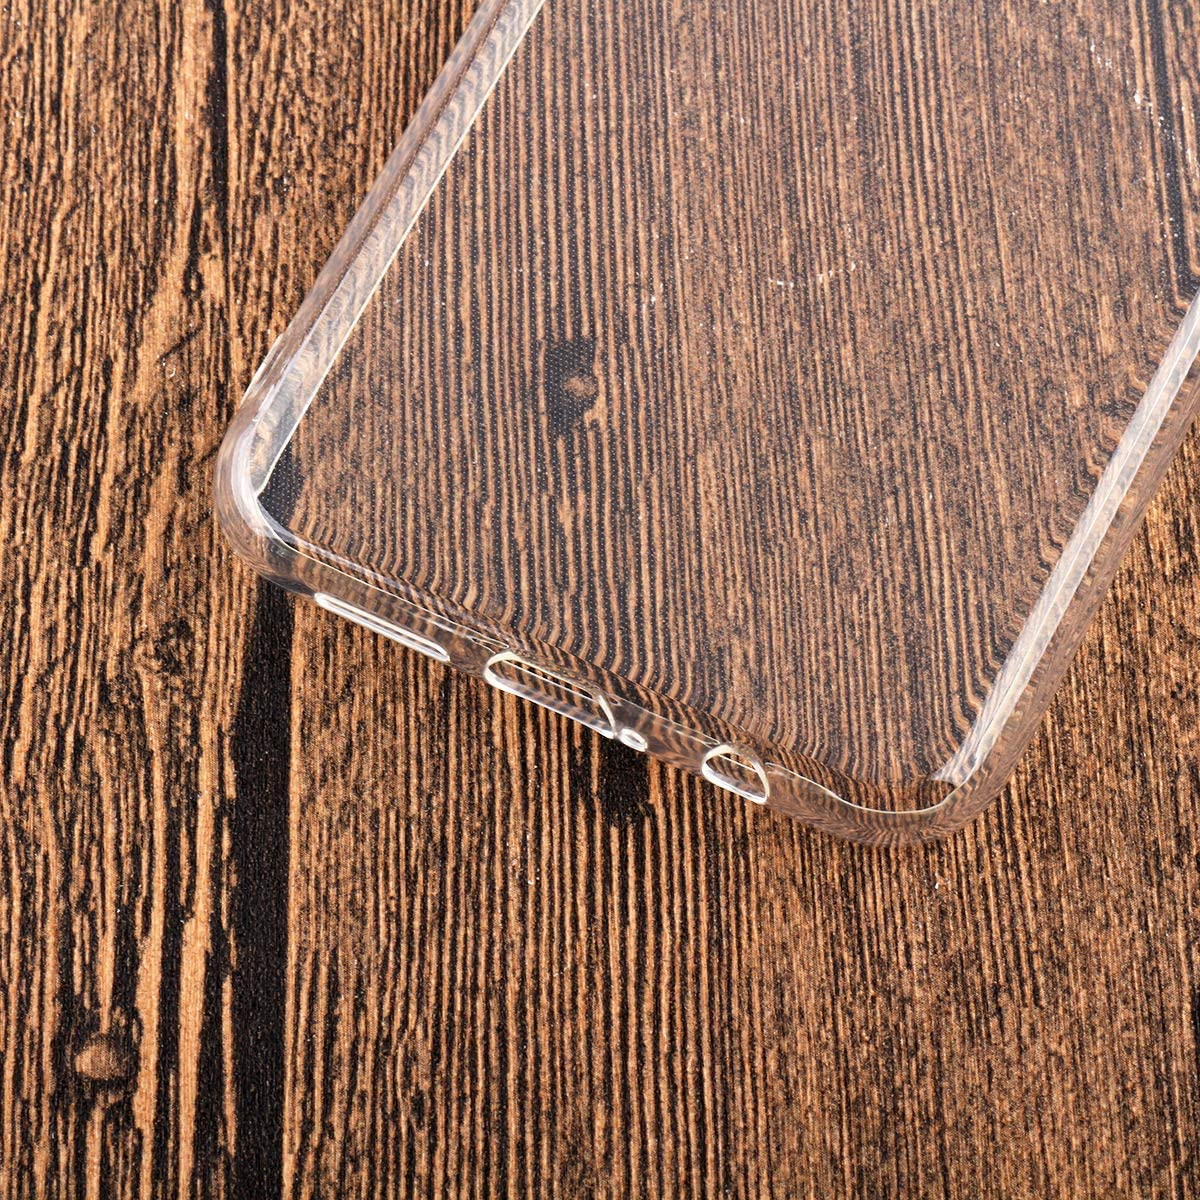 QFSM Transparente Funda 5.71 Cristal Templado para Huawei Y5 2019 9H Dureza Duradera Protectora Pantalla Glass Film Protector-WM22 Shell Silicona Carcasa Suave TPU Case Cover